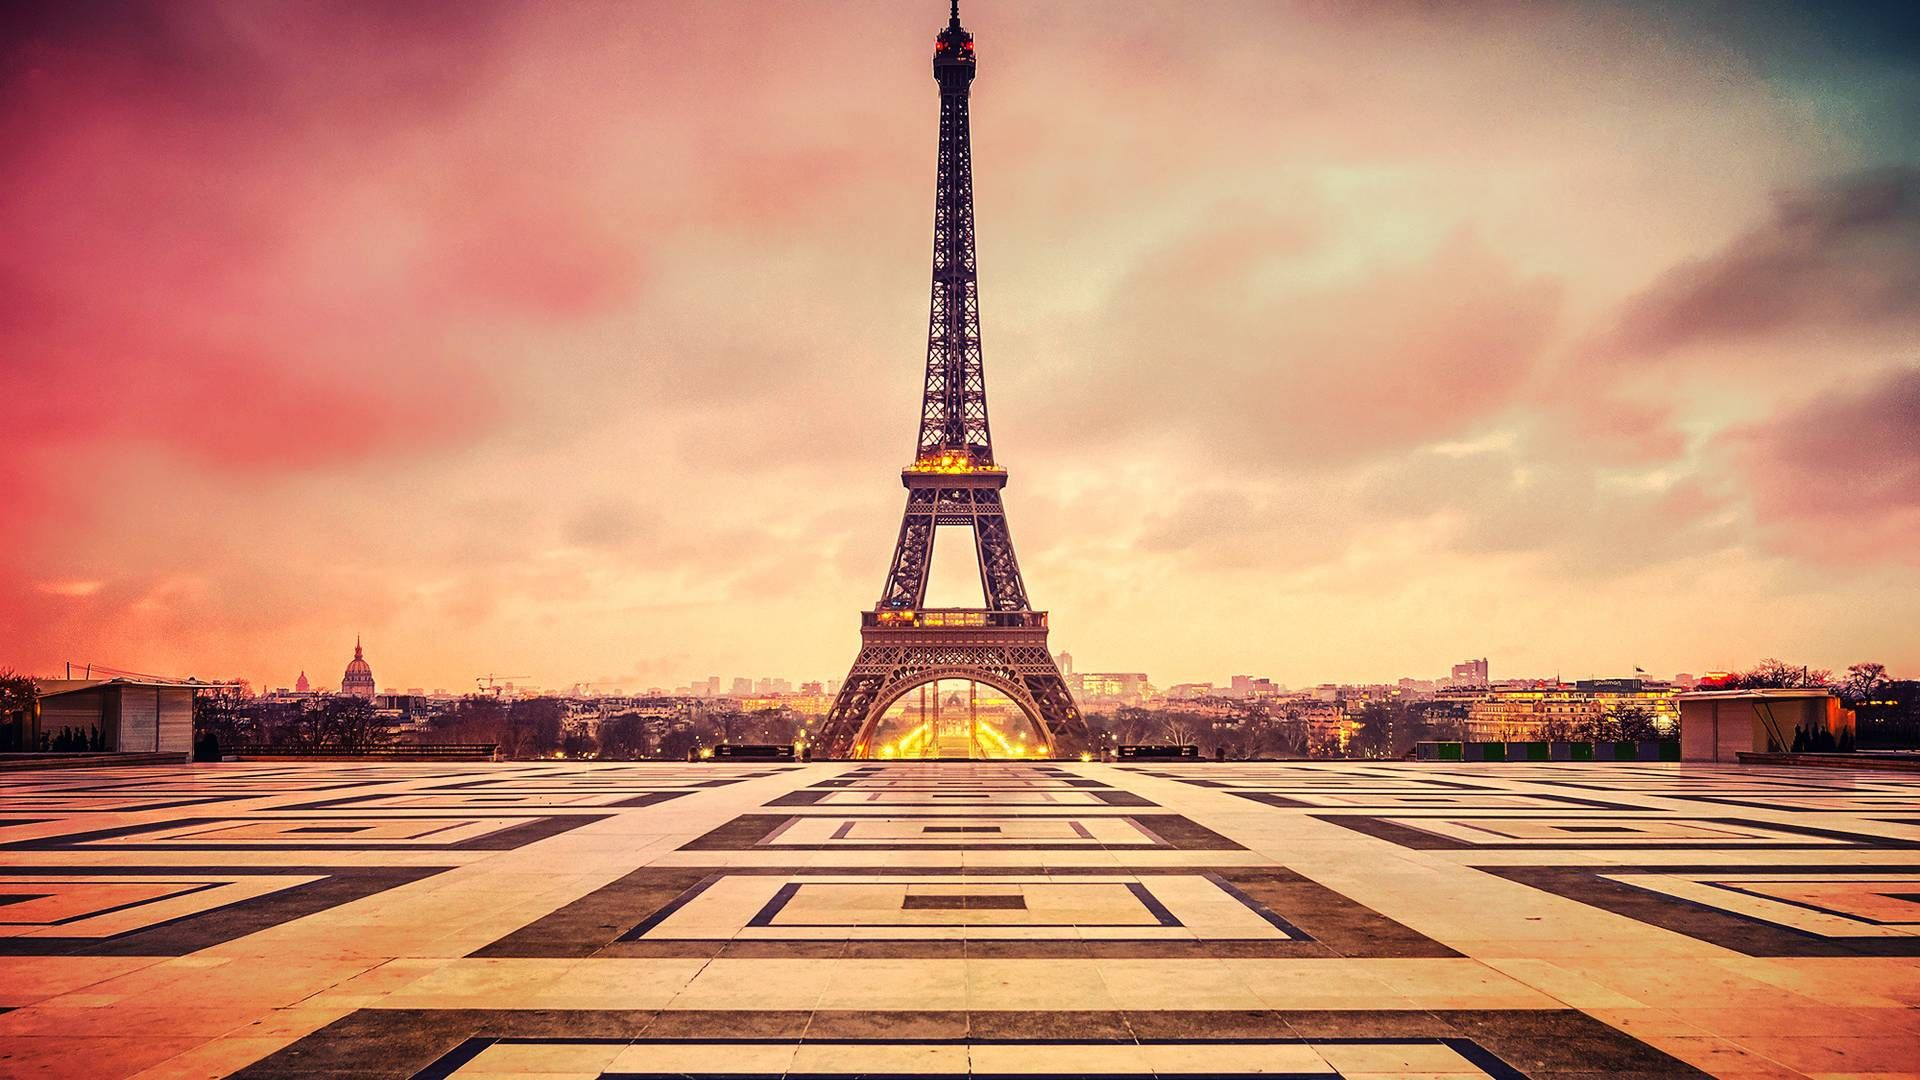 Обои Eiffel tower, france, paris, la tour eiffel. Города foto 10